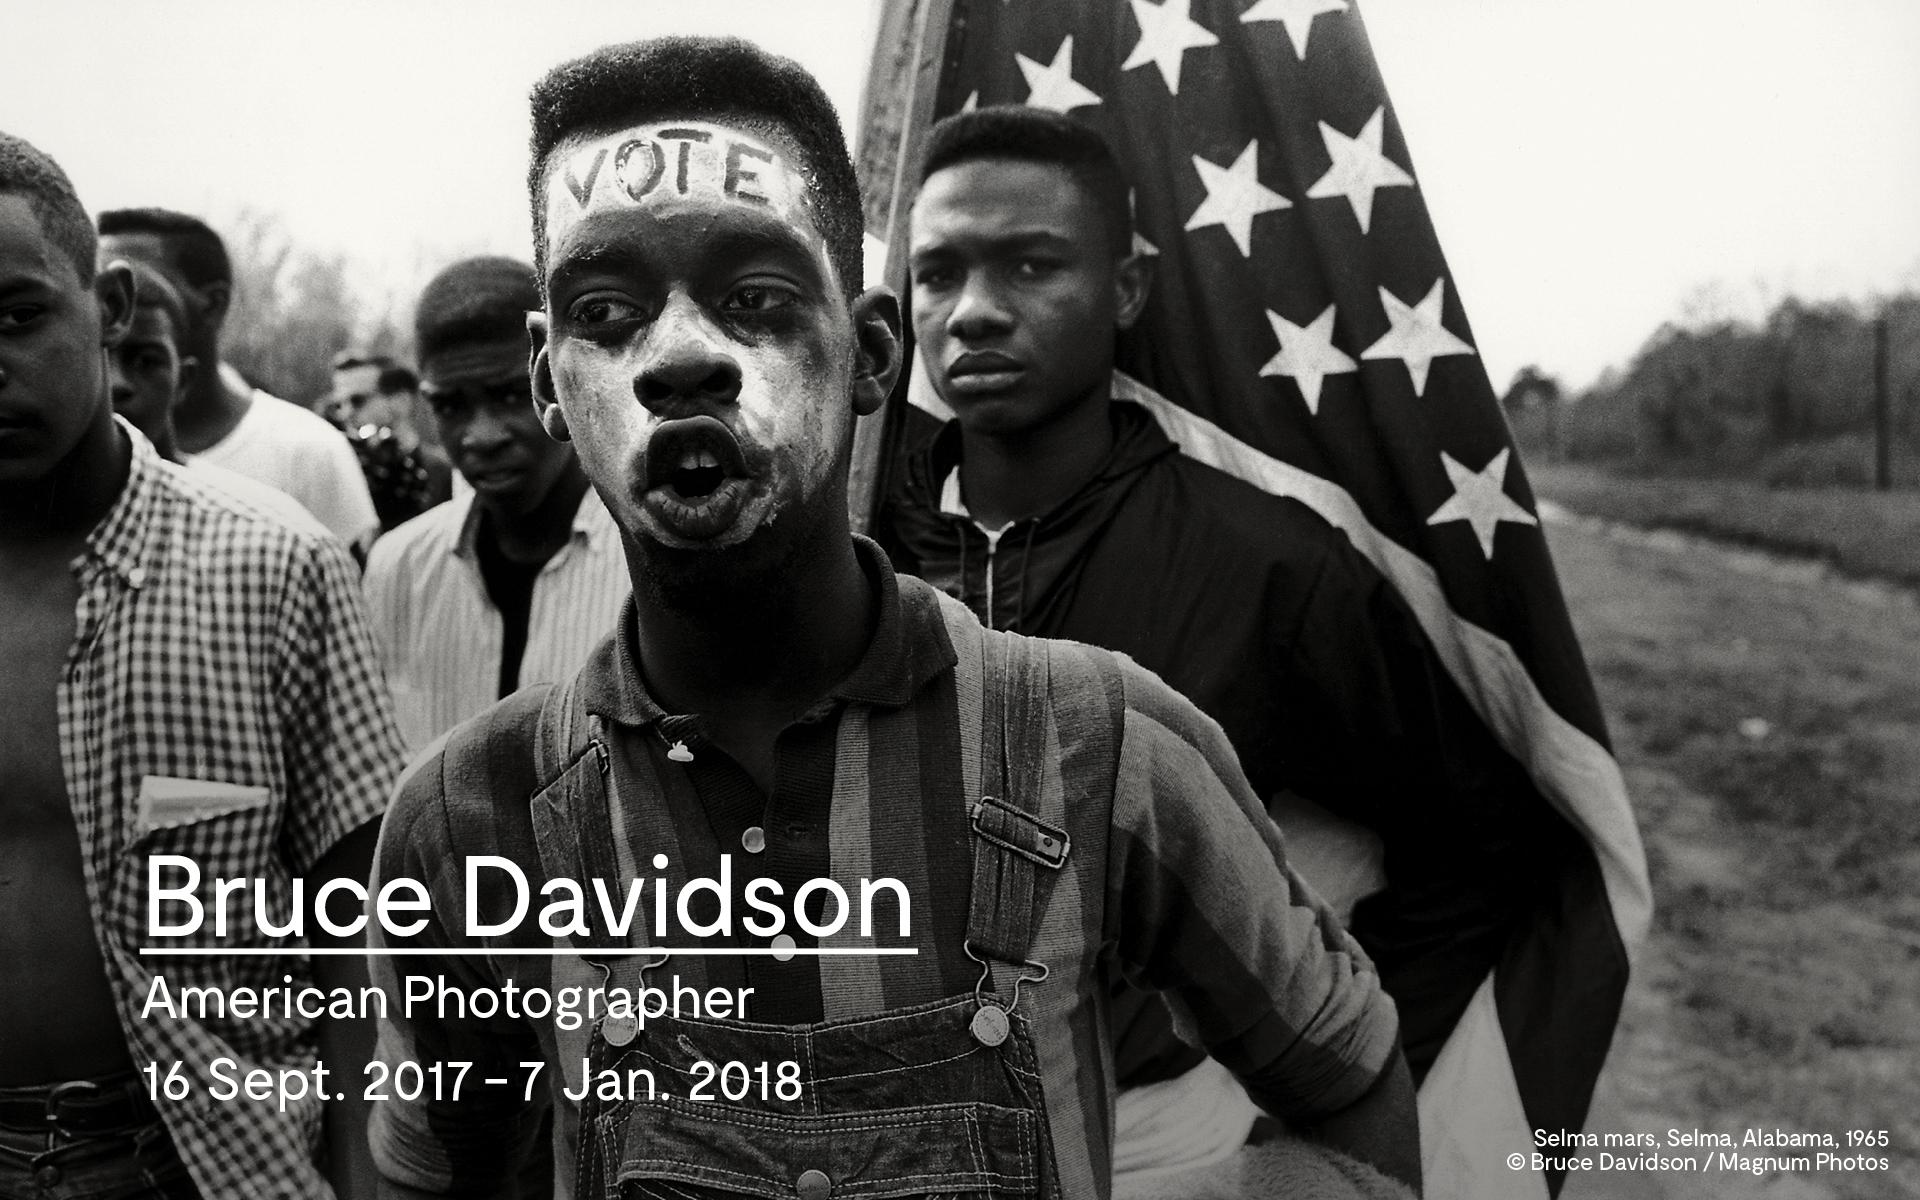 bruce-davidson-american-photographer-2